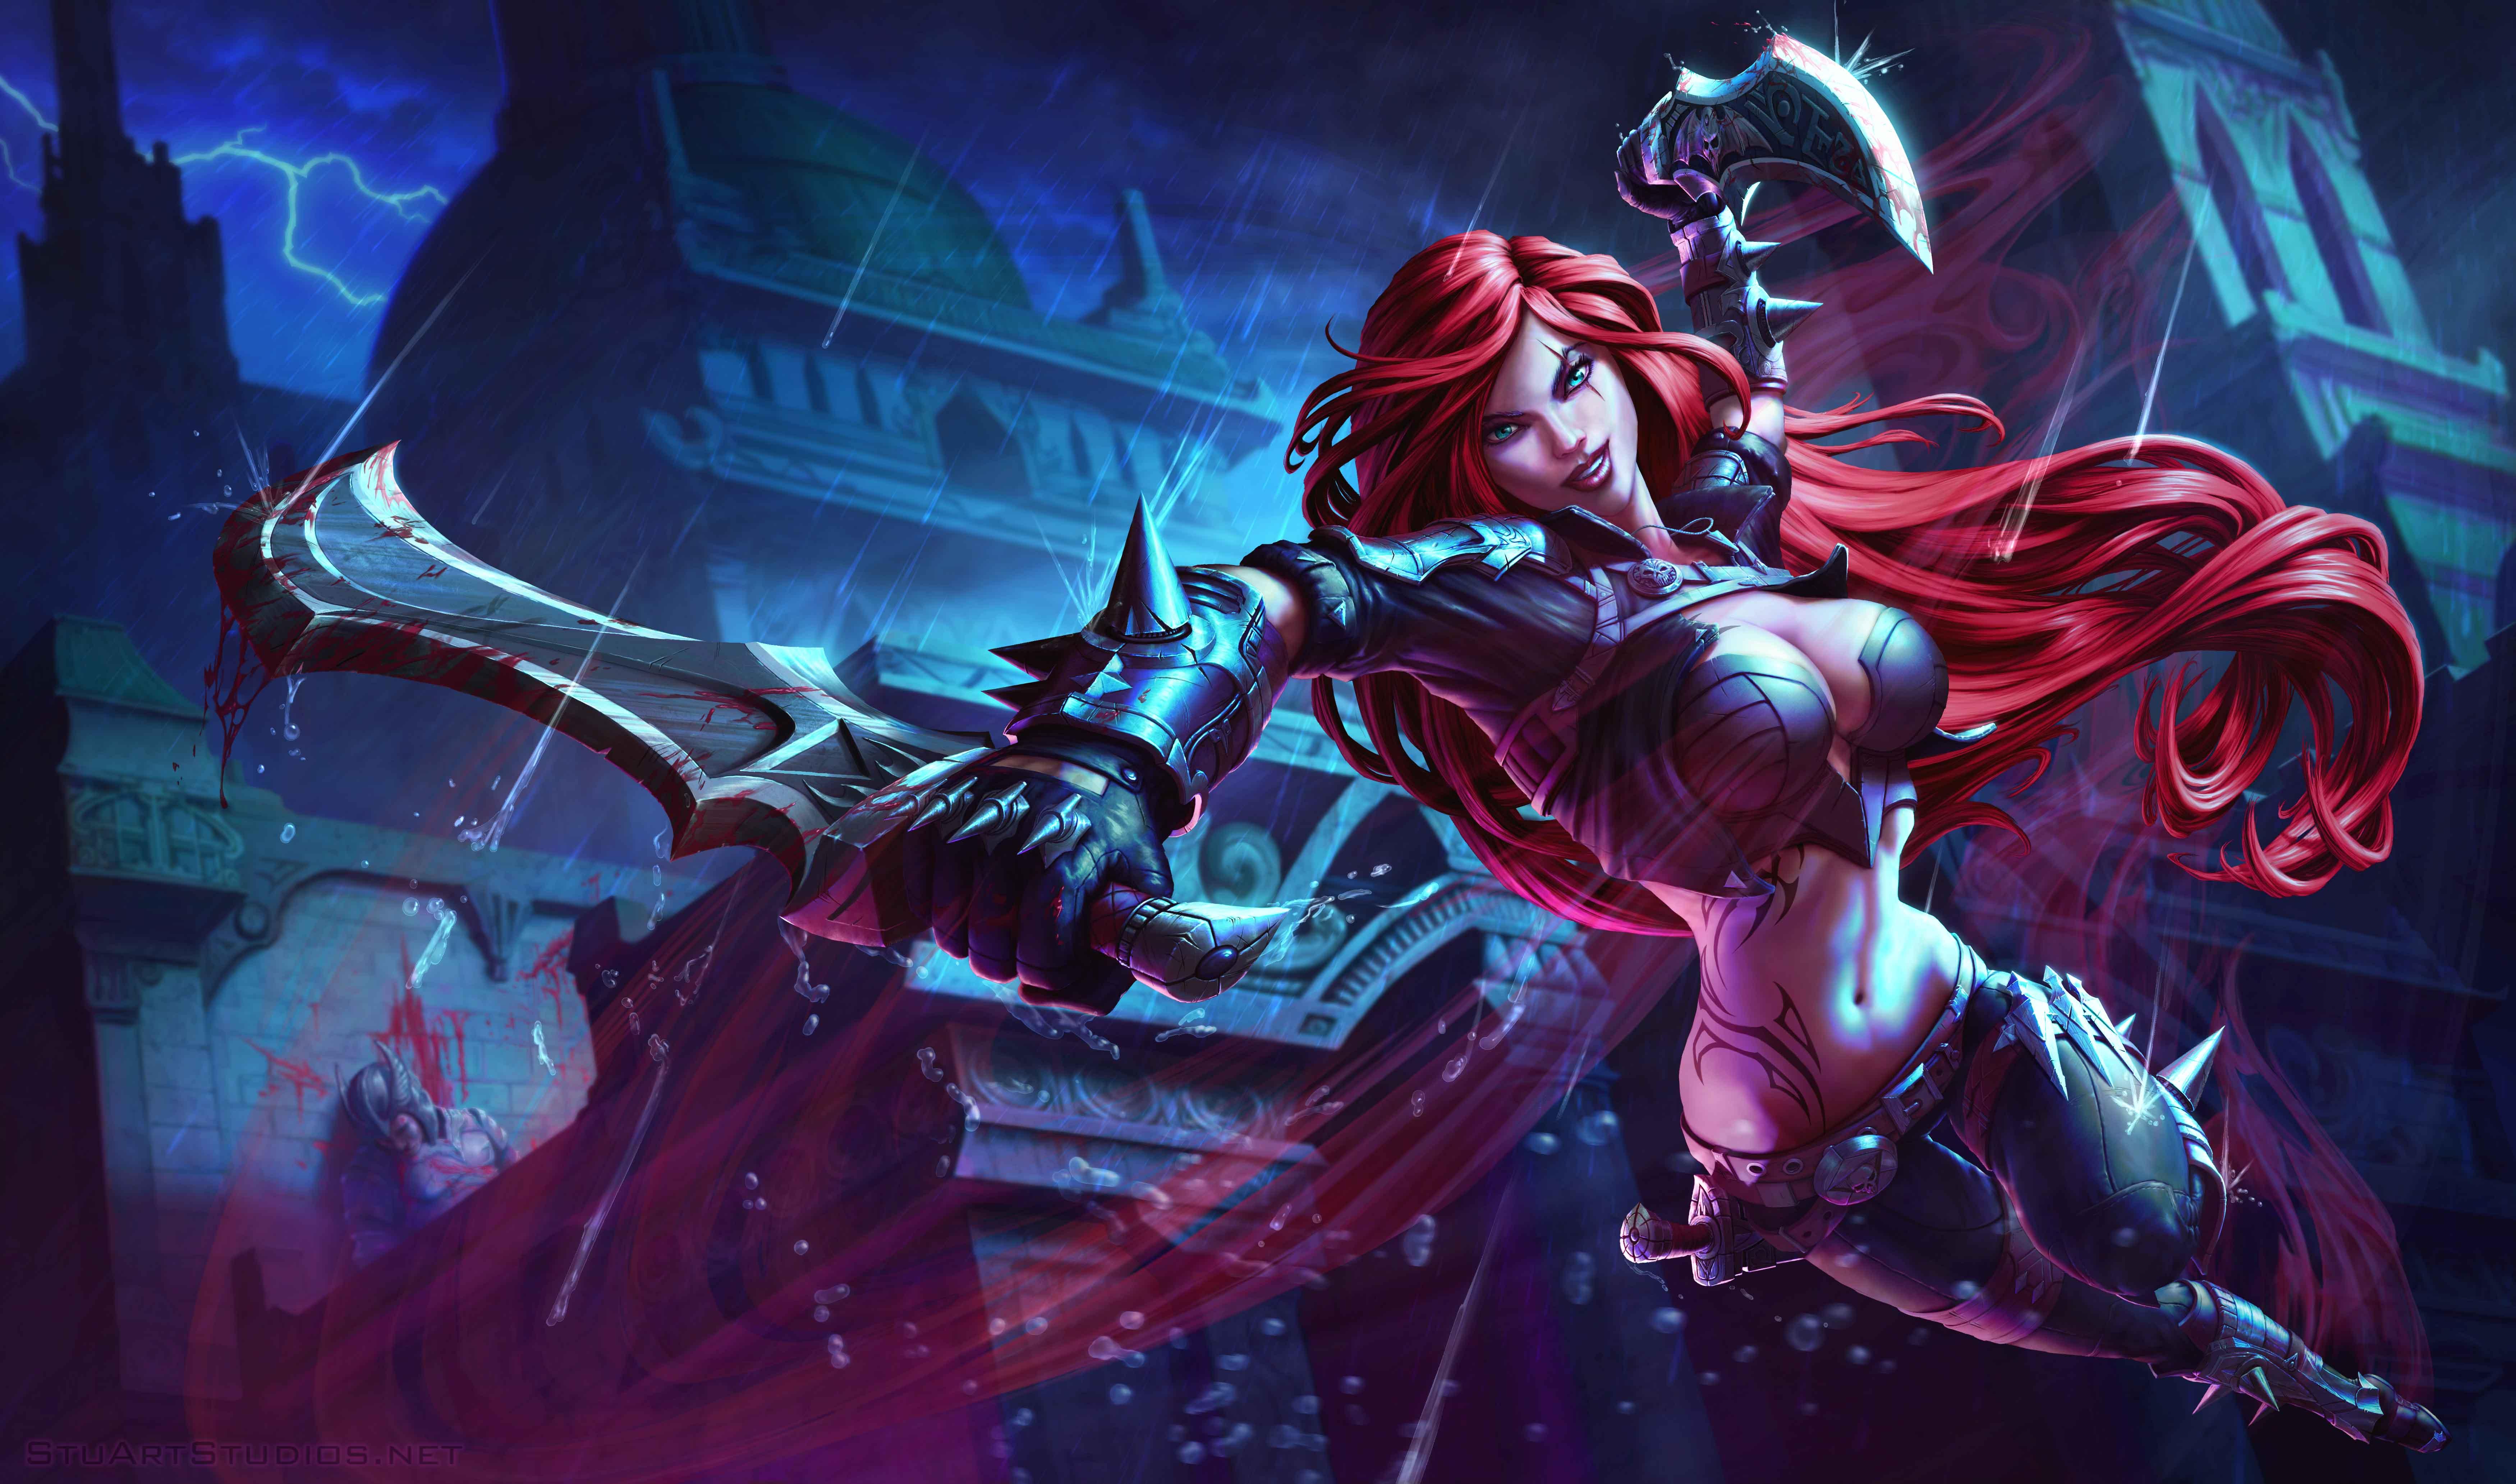 Fondos de pantalla Katarina League Of Legends